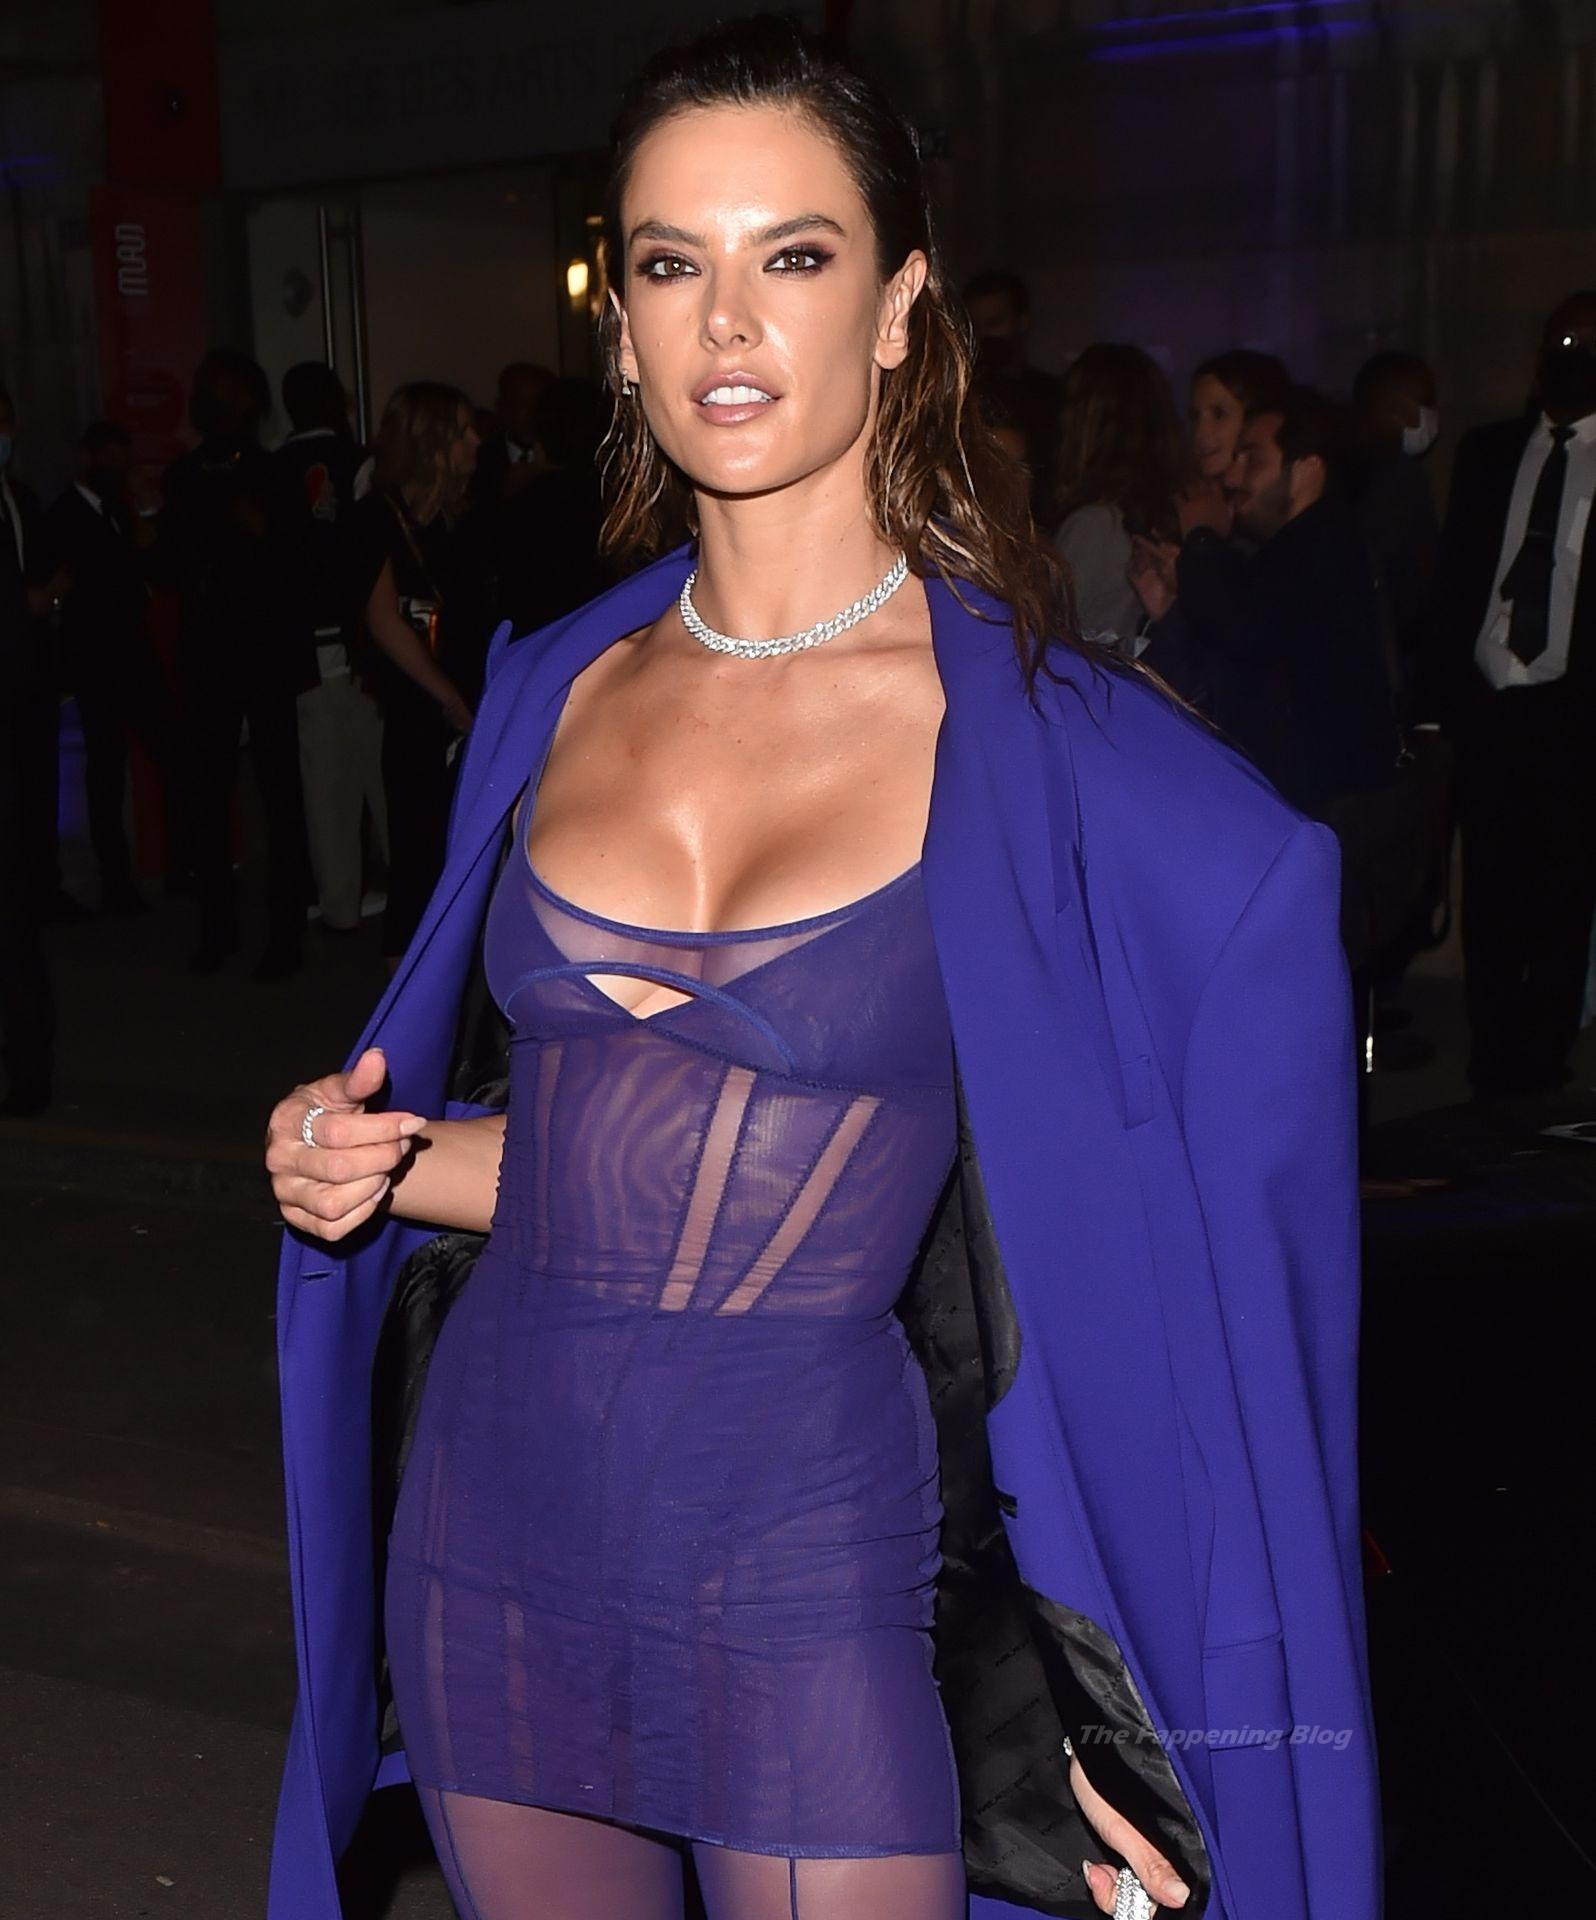 Alessandra-Ambrosio-Sexy-The-Fappening-Blog-70-1.jpg